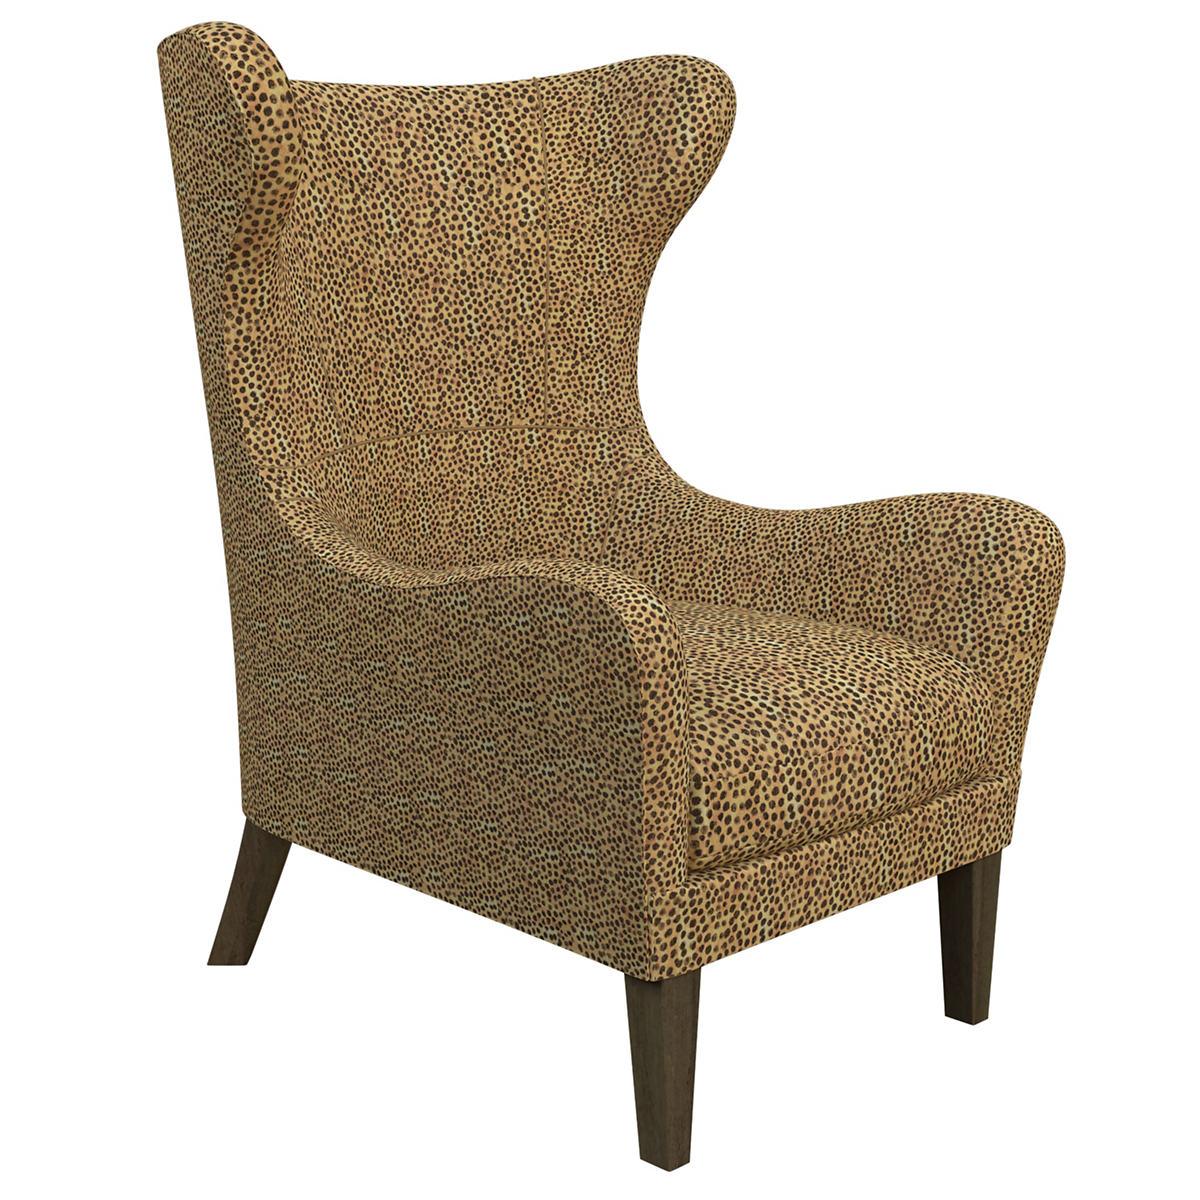 Cheetah Linen Mirage Smoke Chair